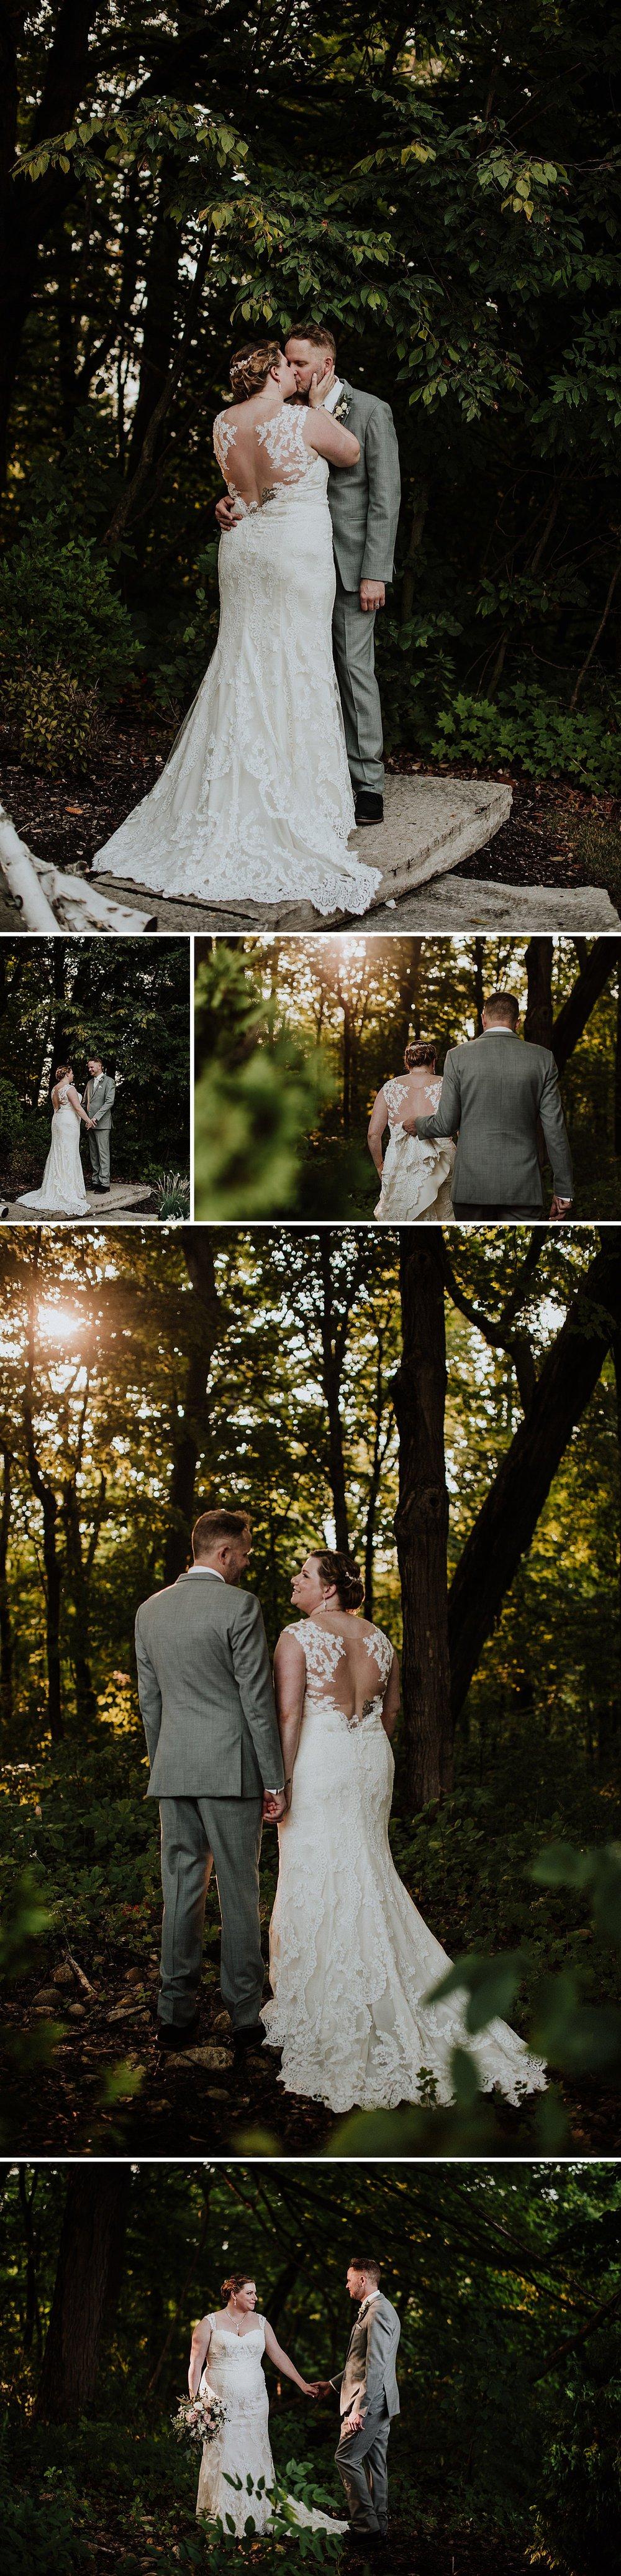 Terrace-167-Documentary-Wedding-Photographer_0026.jpg